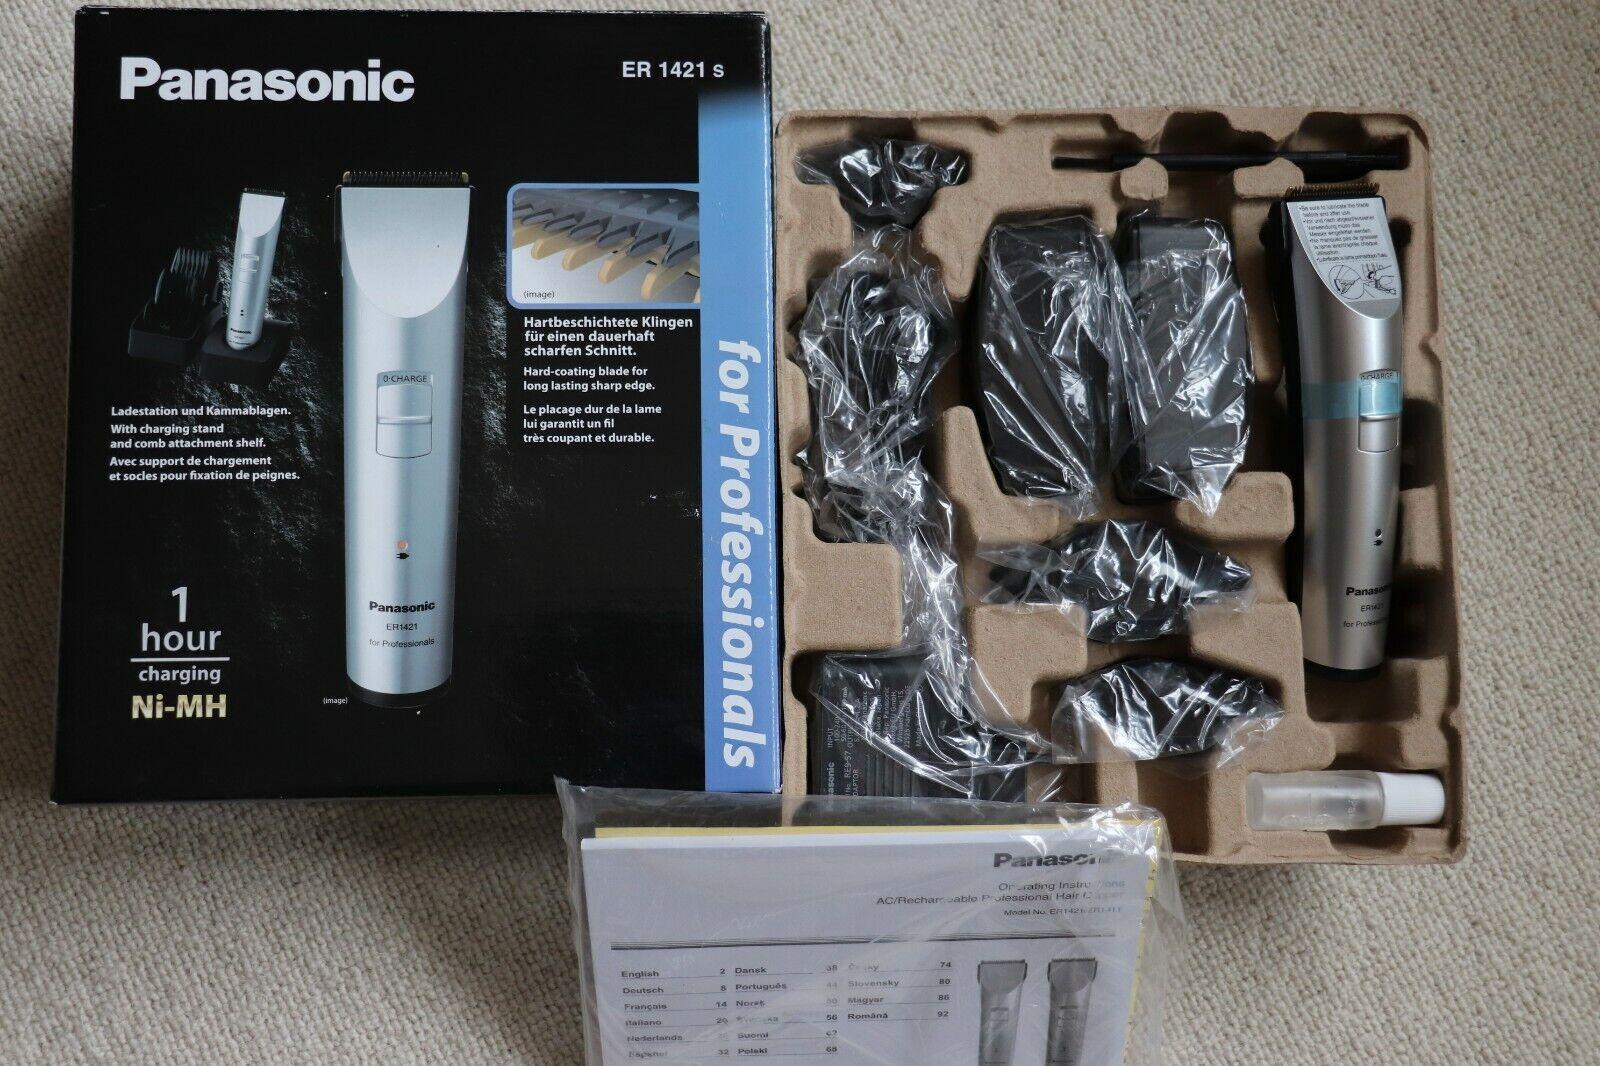 Panasonic ER 1421 ER1421 s Haarschneider, Haarschneidemaschine - NEU in OVP